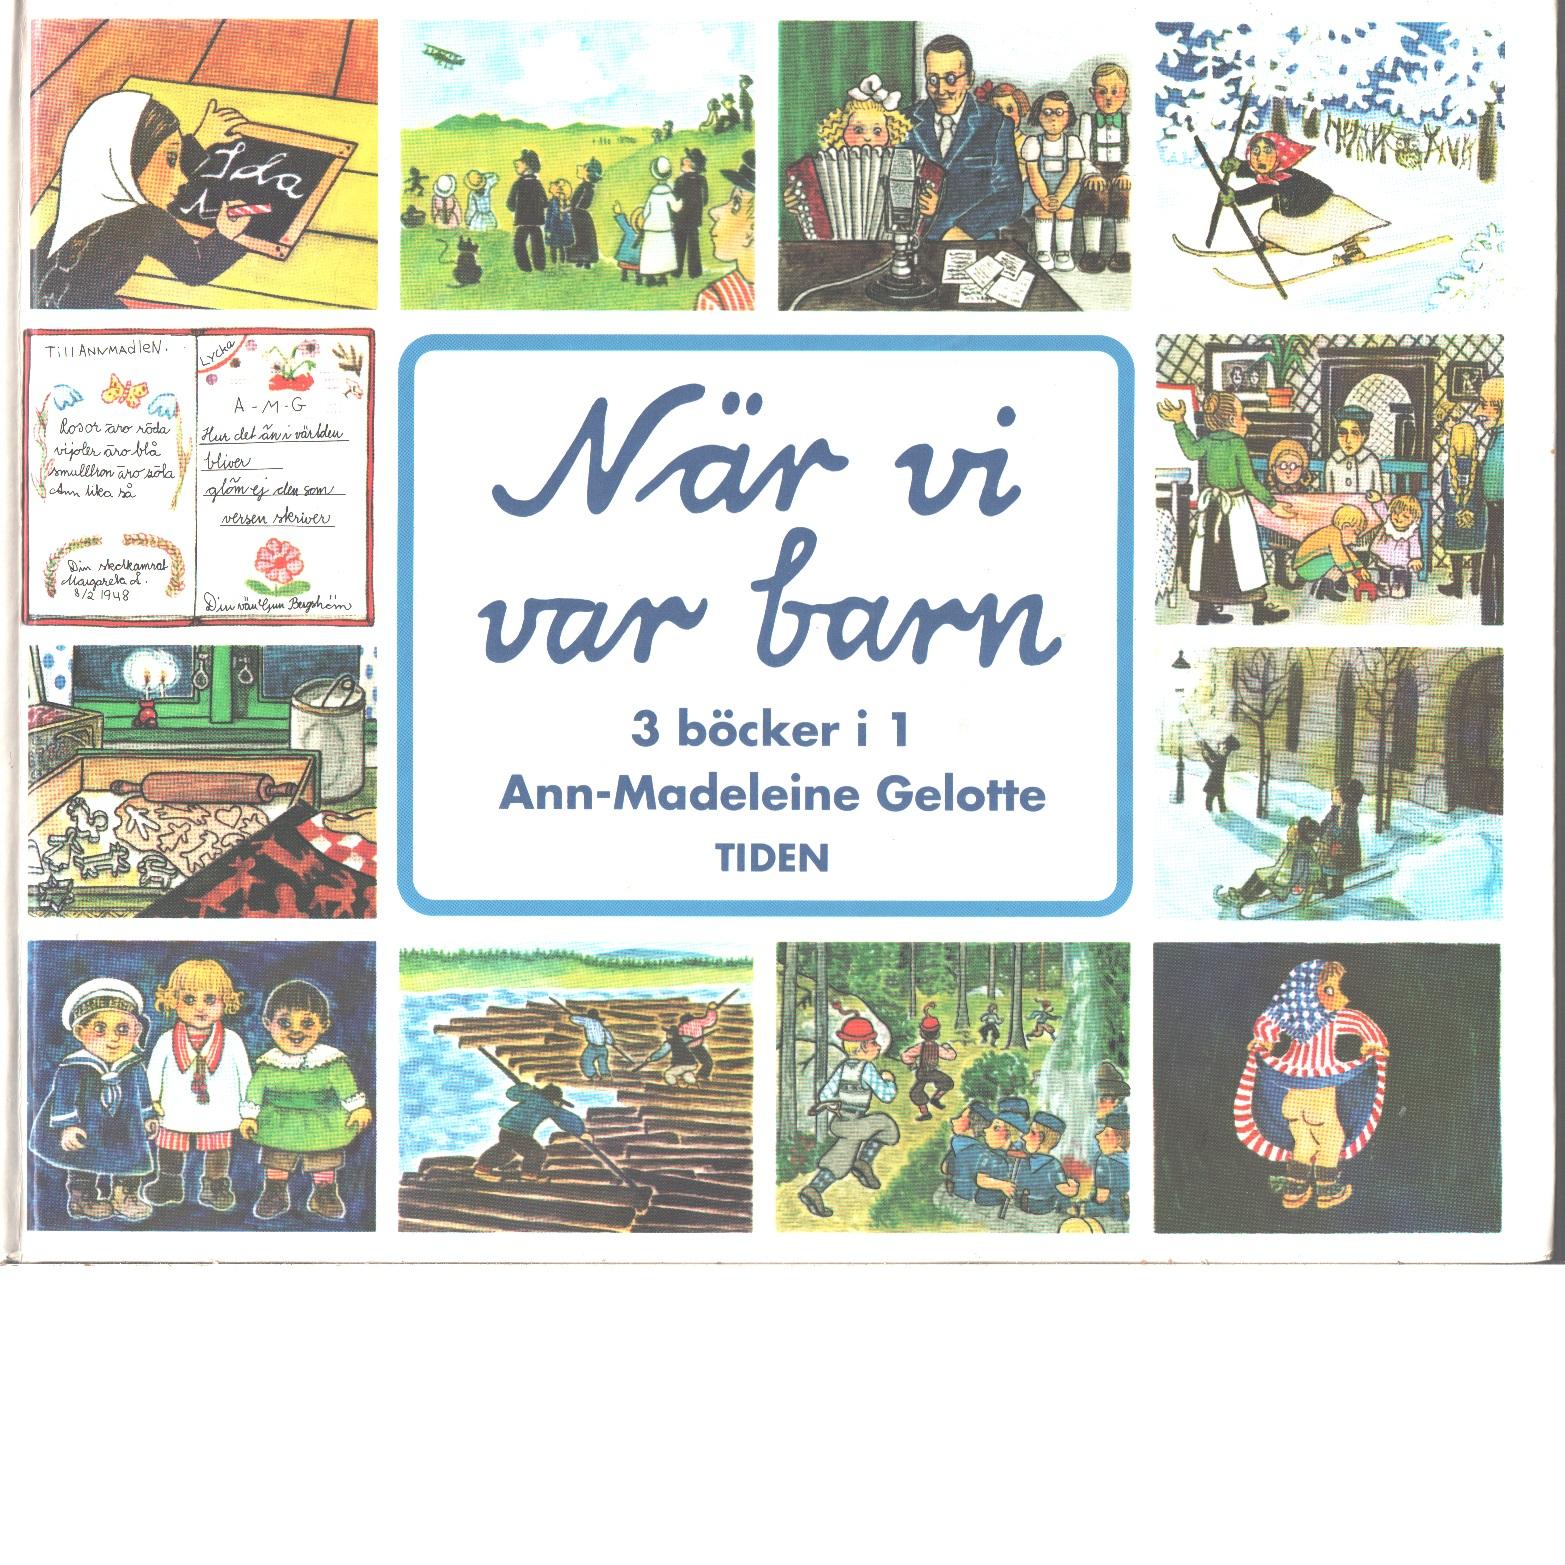 När vi var barn : Ida Maria från Arfliden, Tyra i 10:an Odengatan, Vi bodde i Helenelund i en bok - Gelotte, Ann-Madeleine